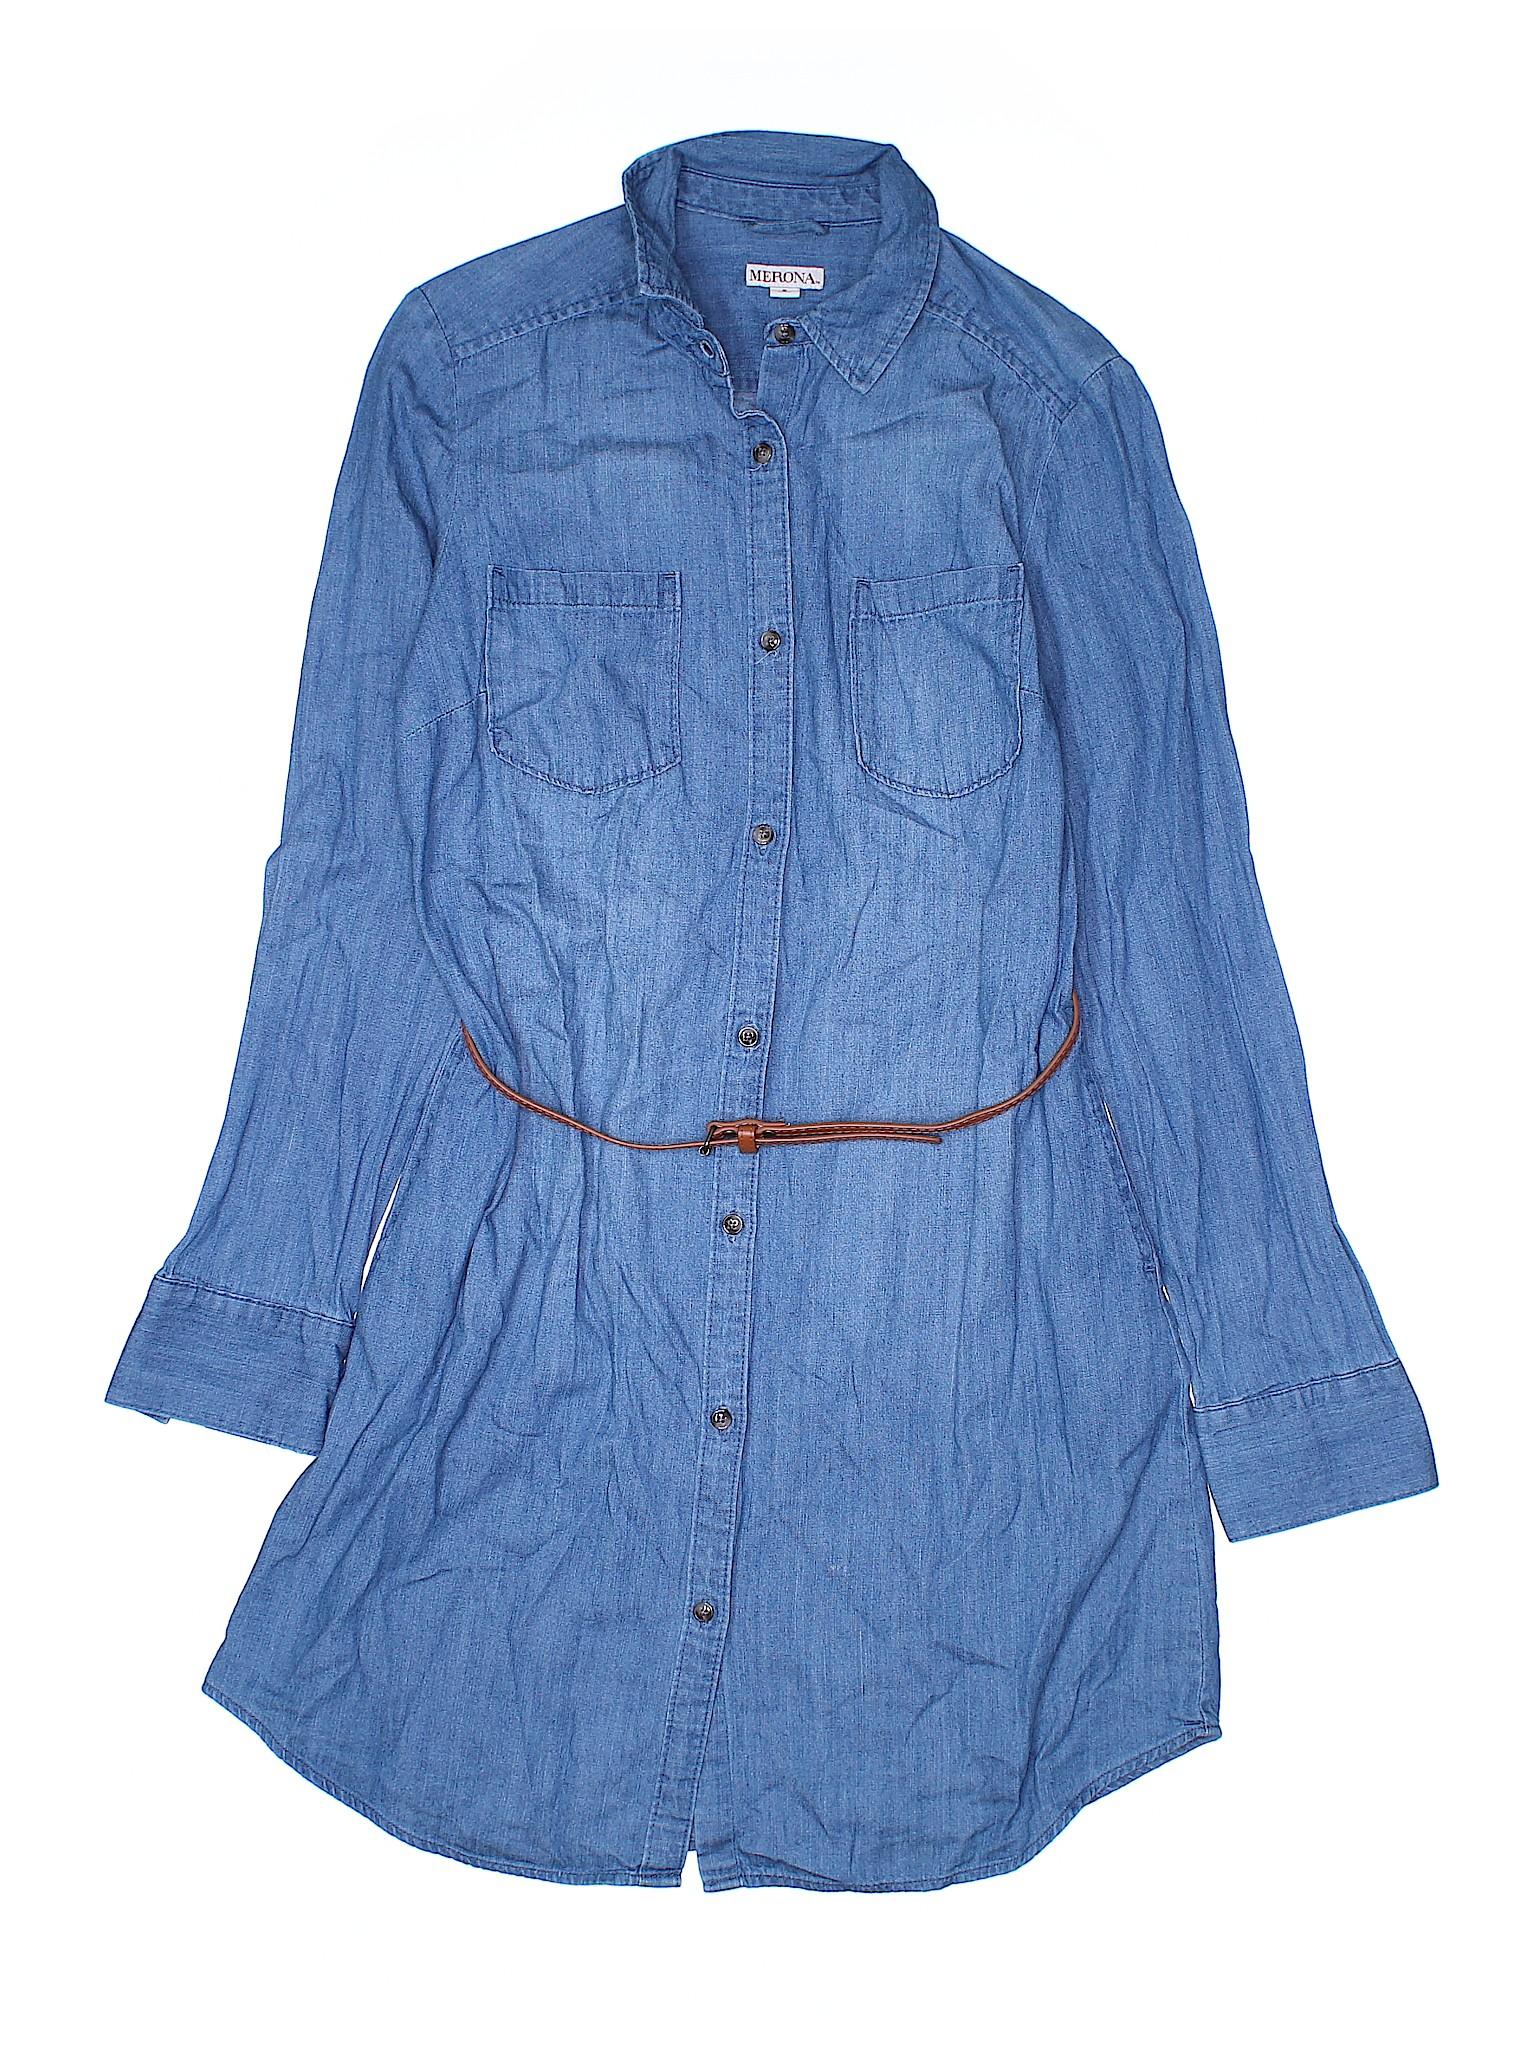 Casual Boutique Dress winter Boutique winter Merona Iz6a5xR